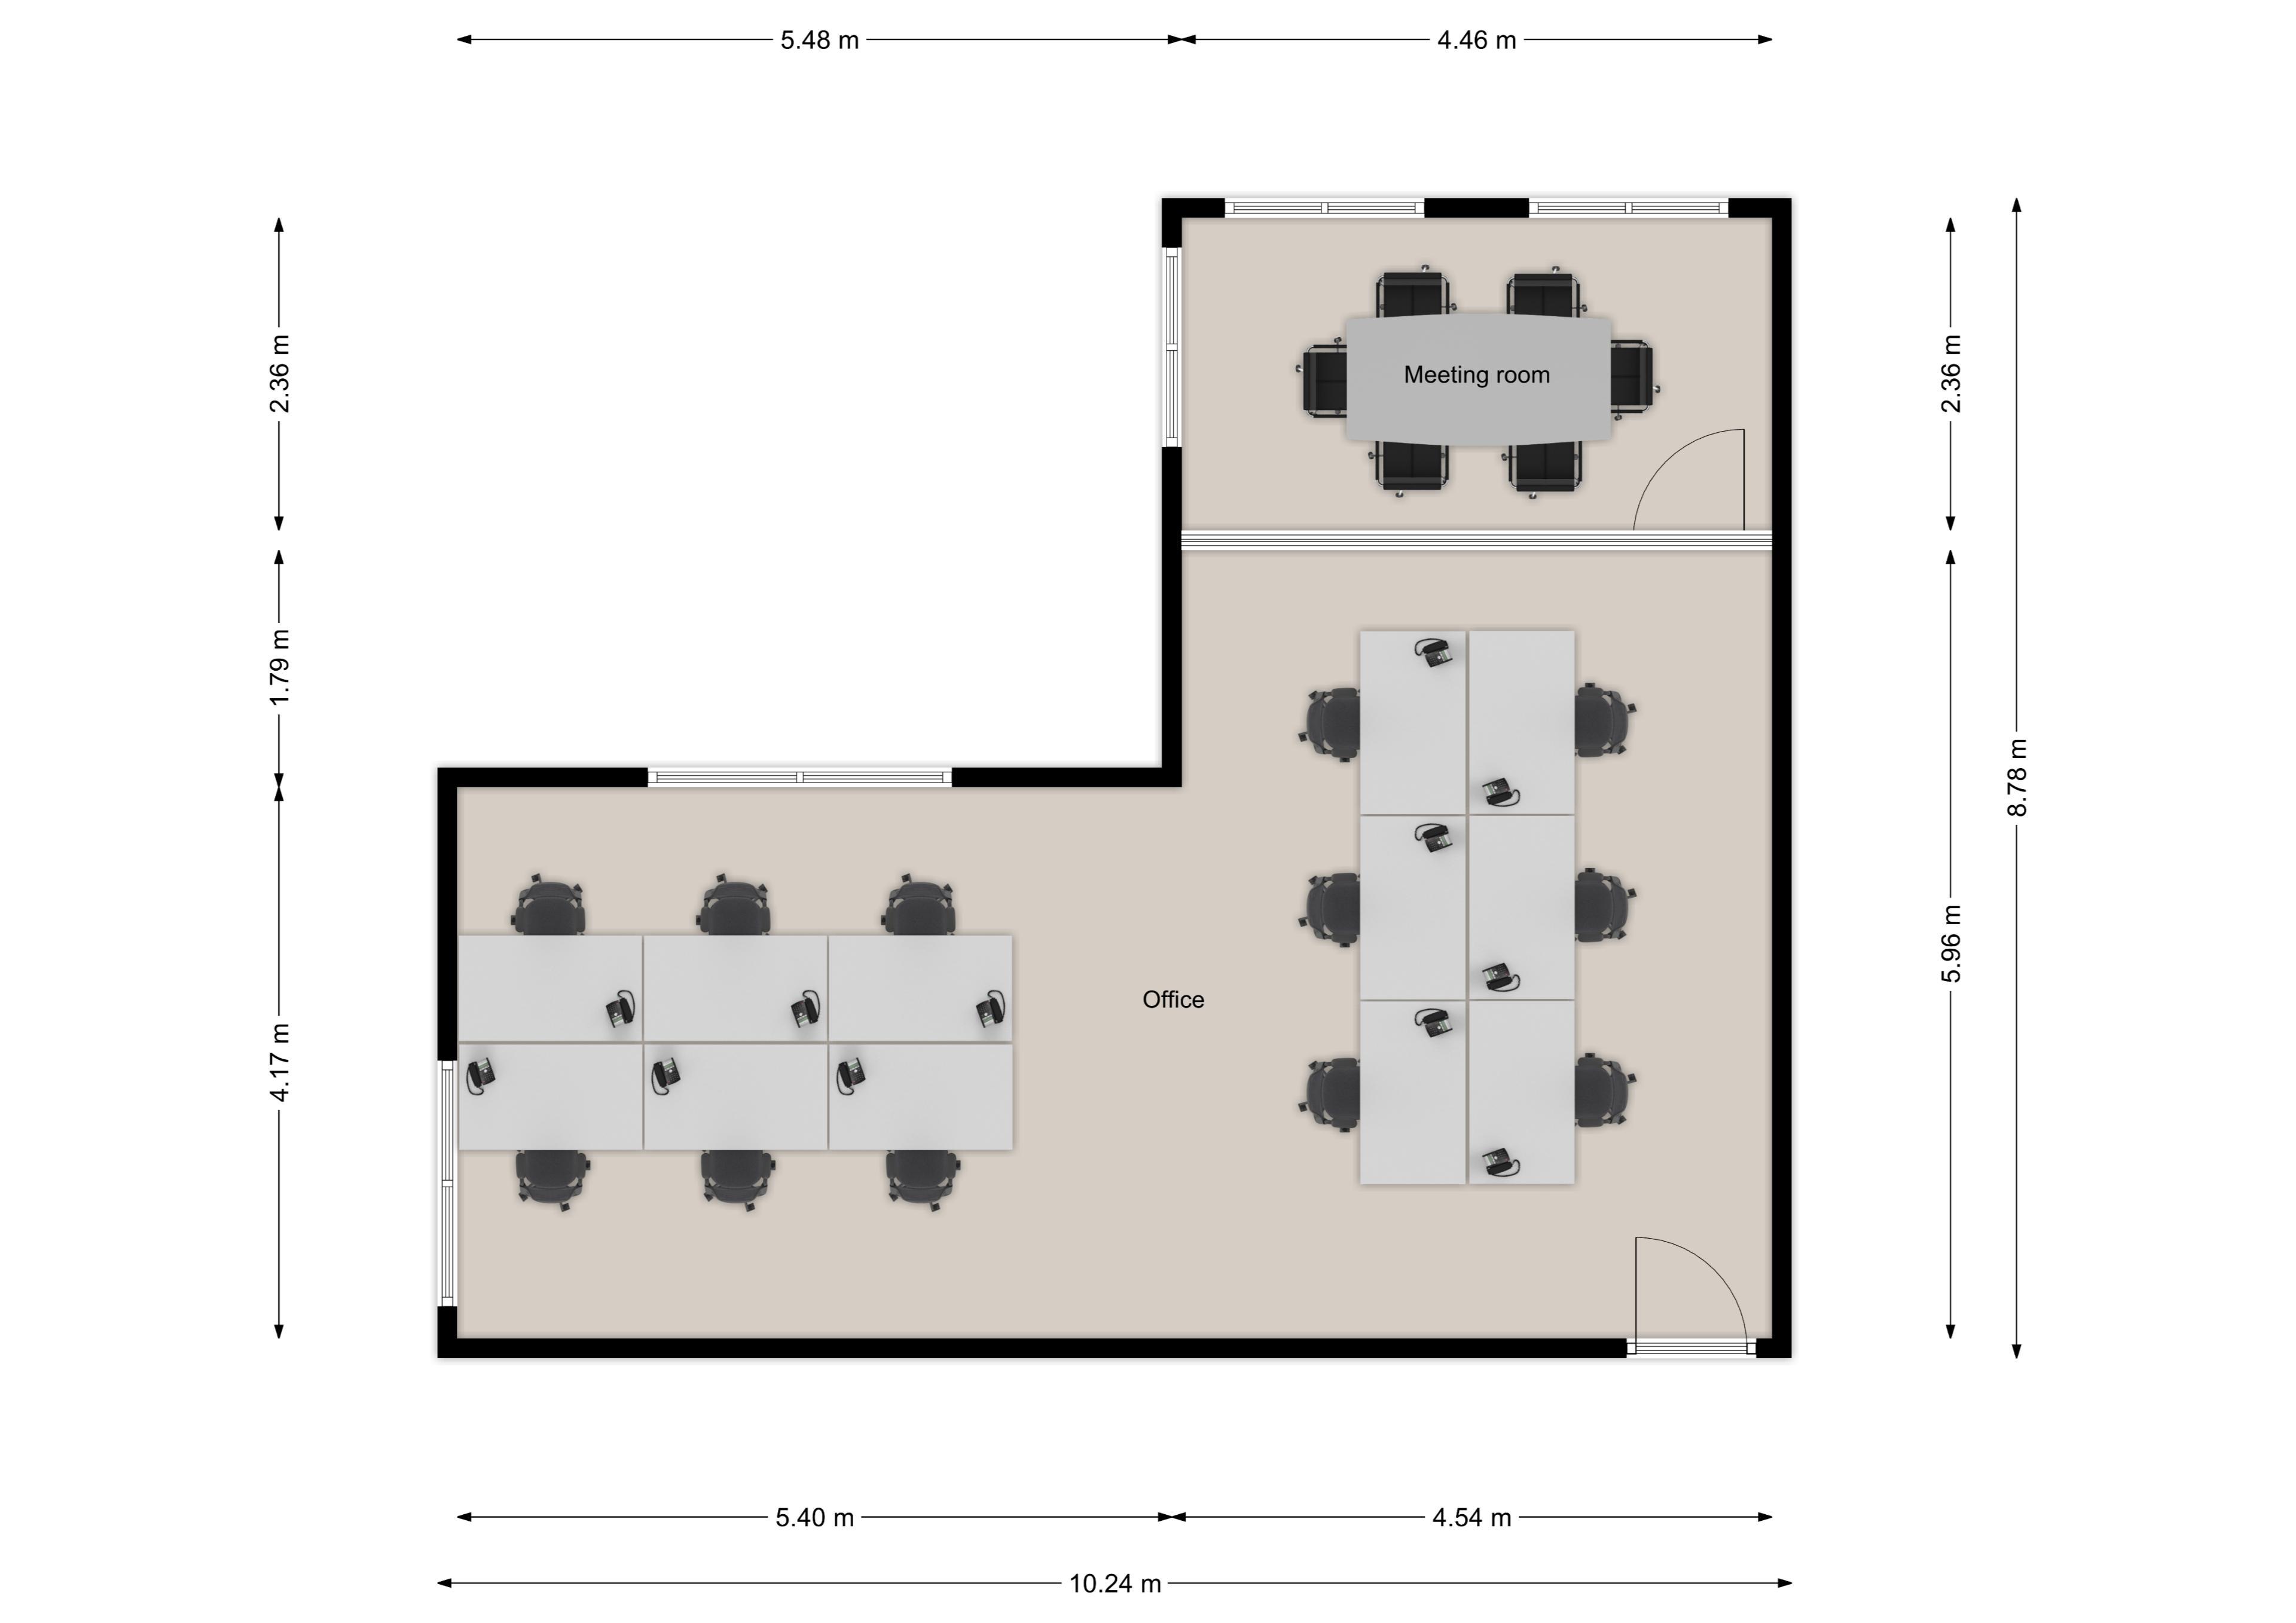 502-3 Floorplan